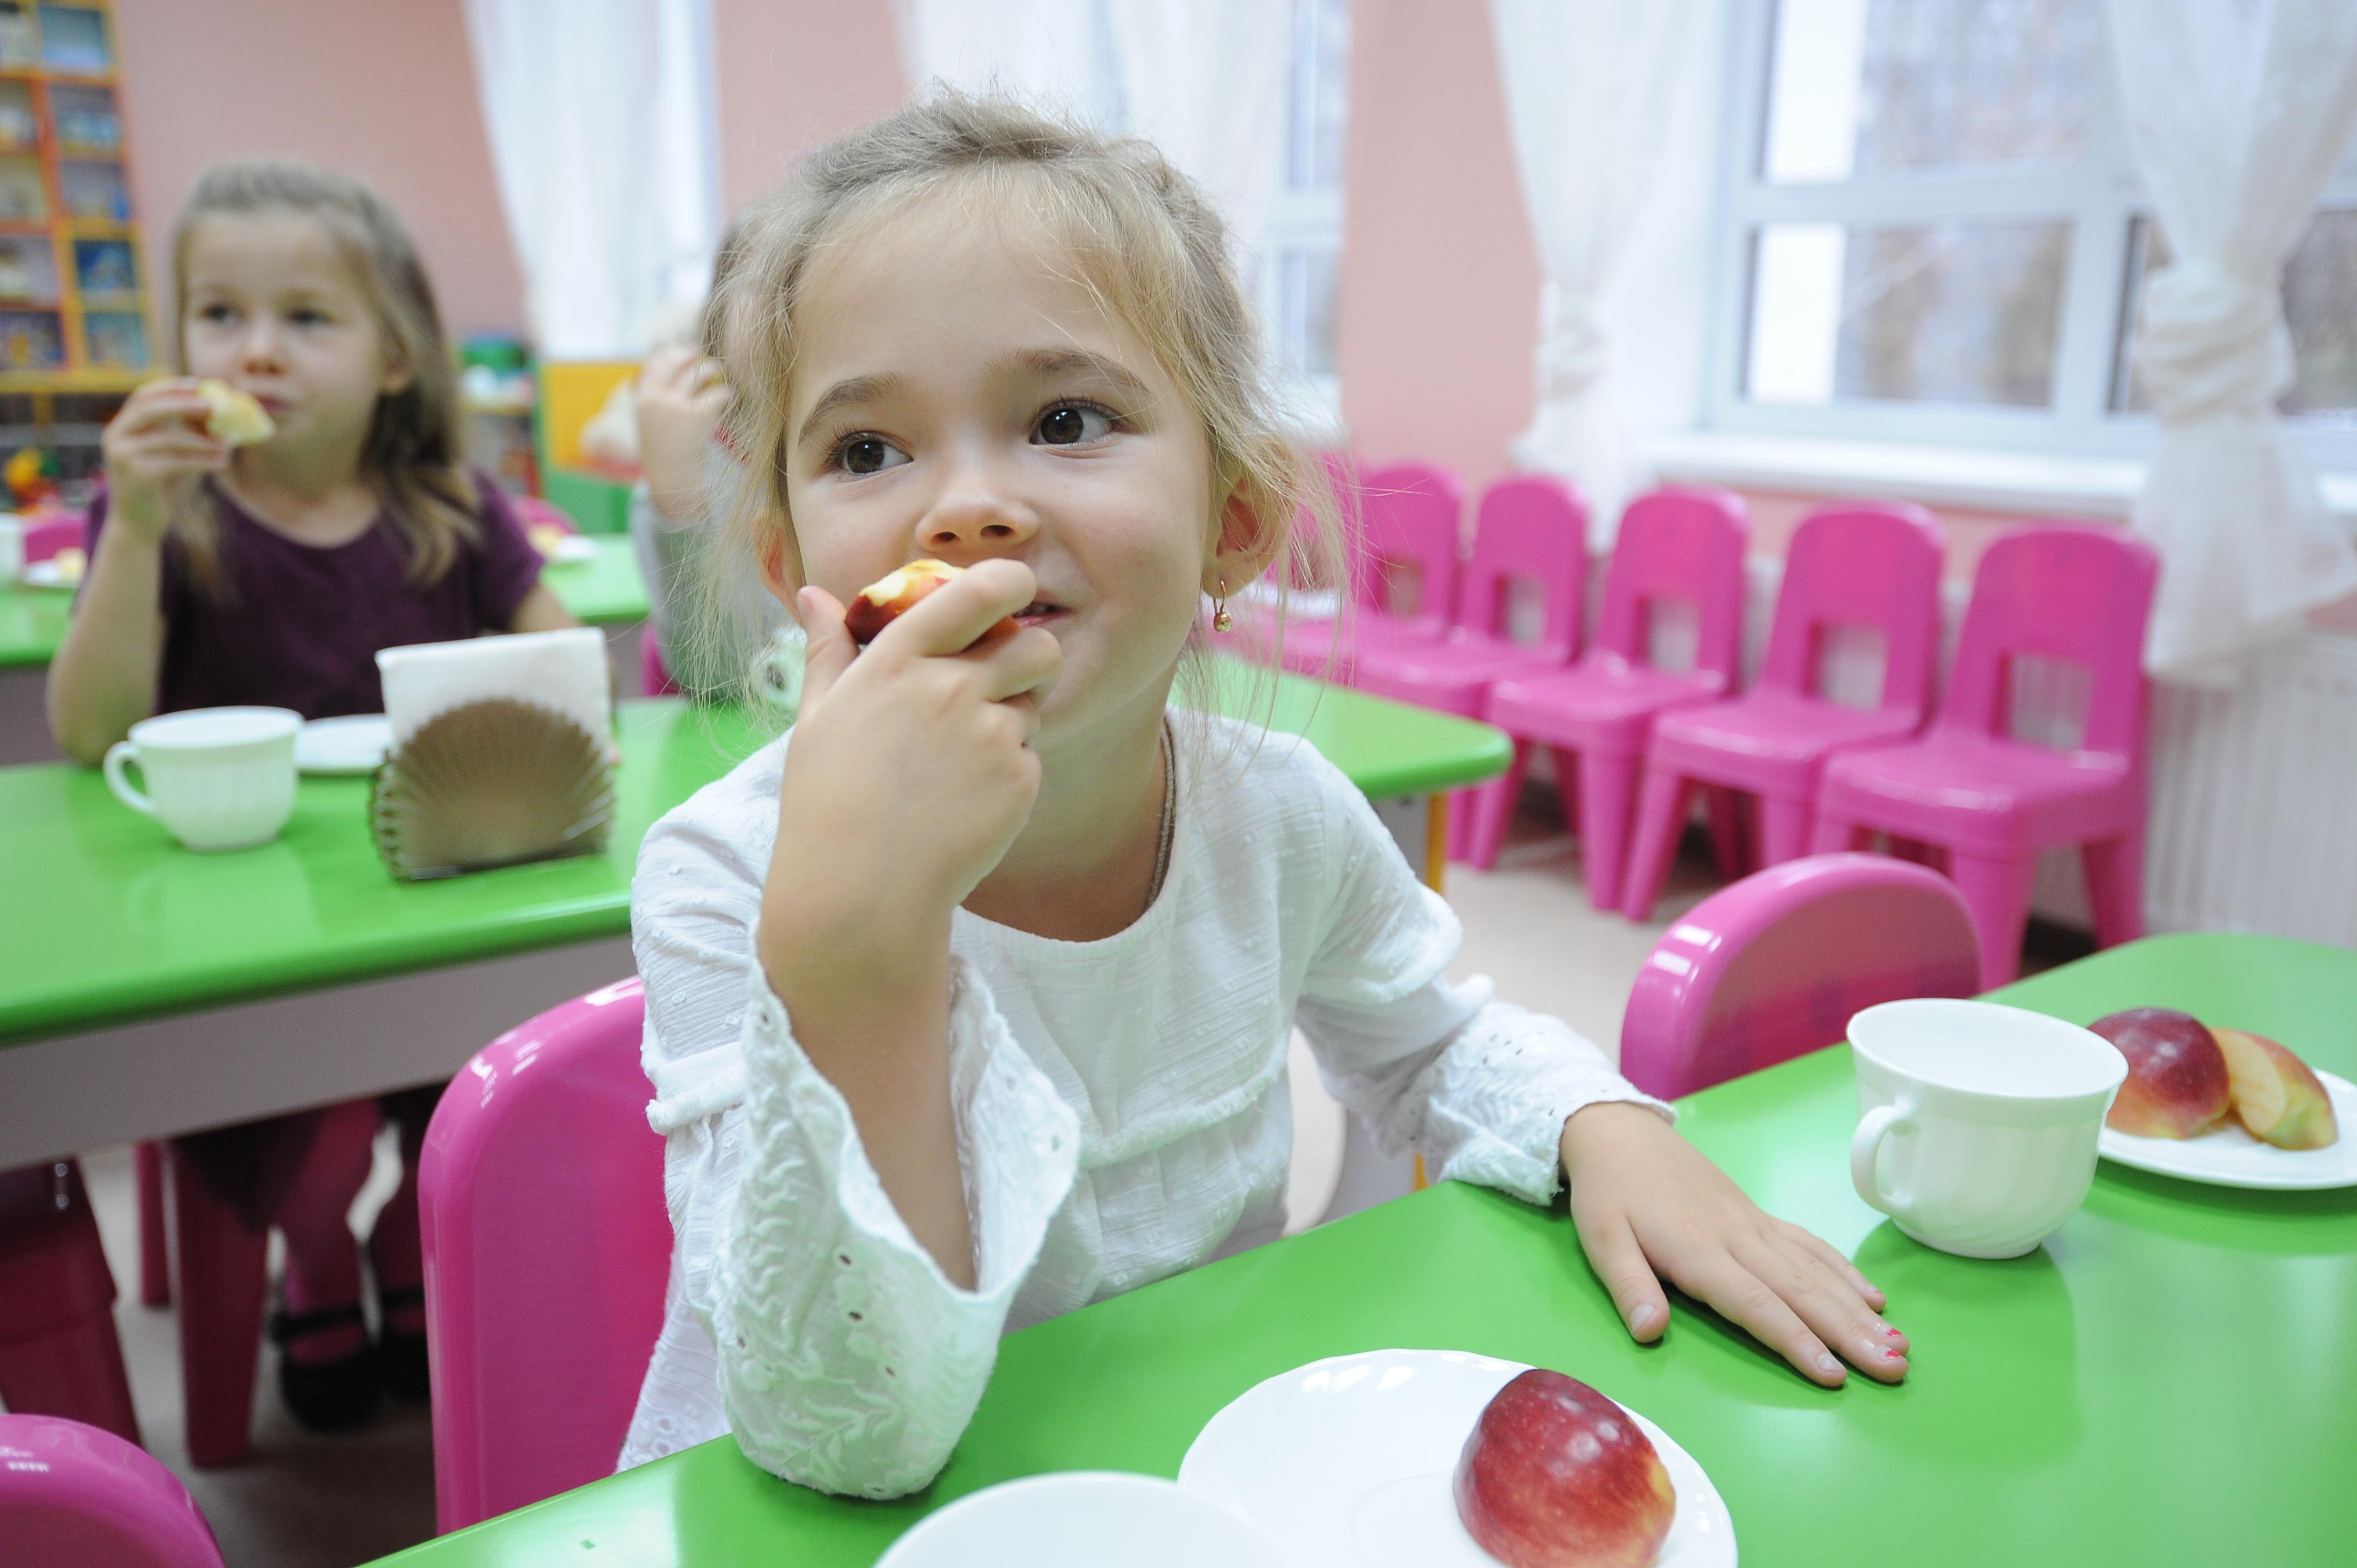 Детский сад с ярким фасадом построят на юго-западе Москвы